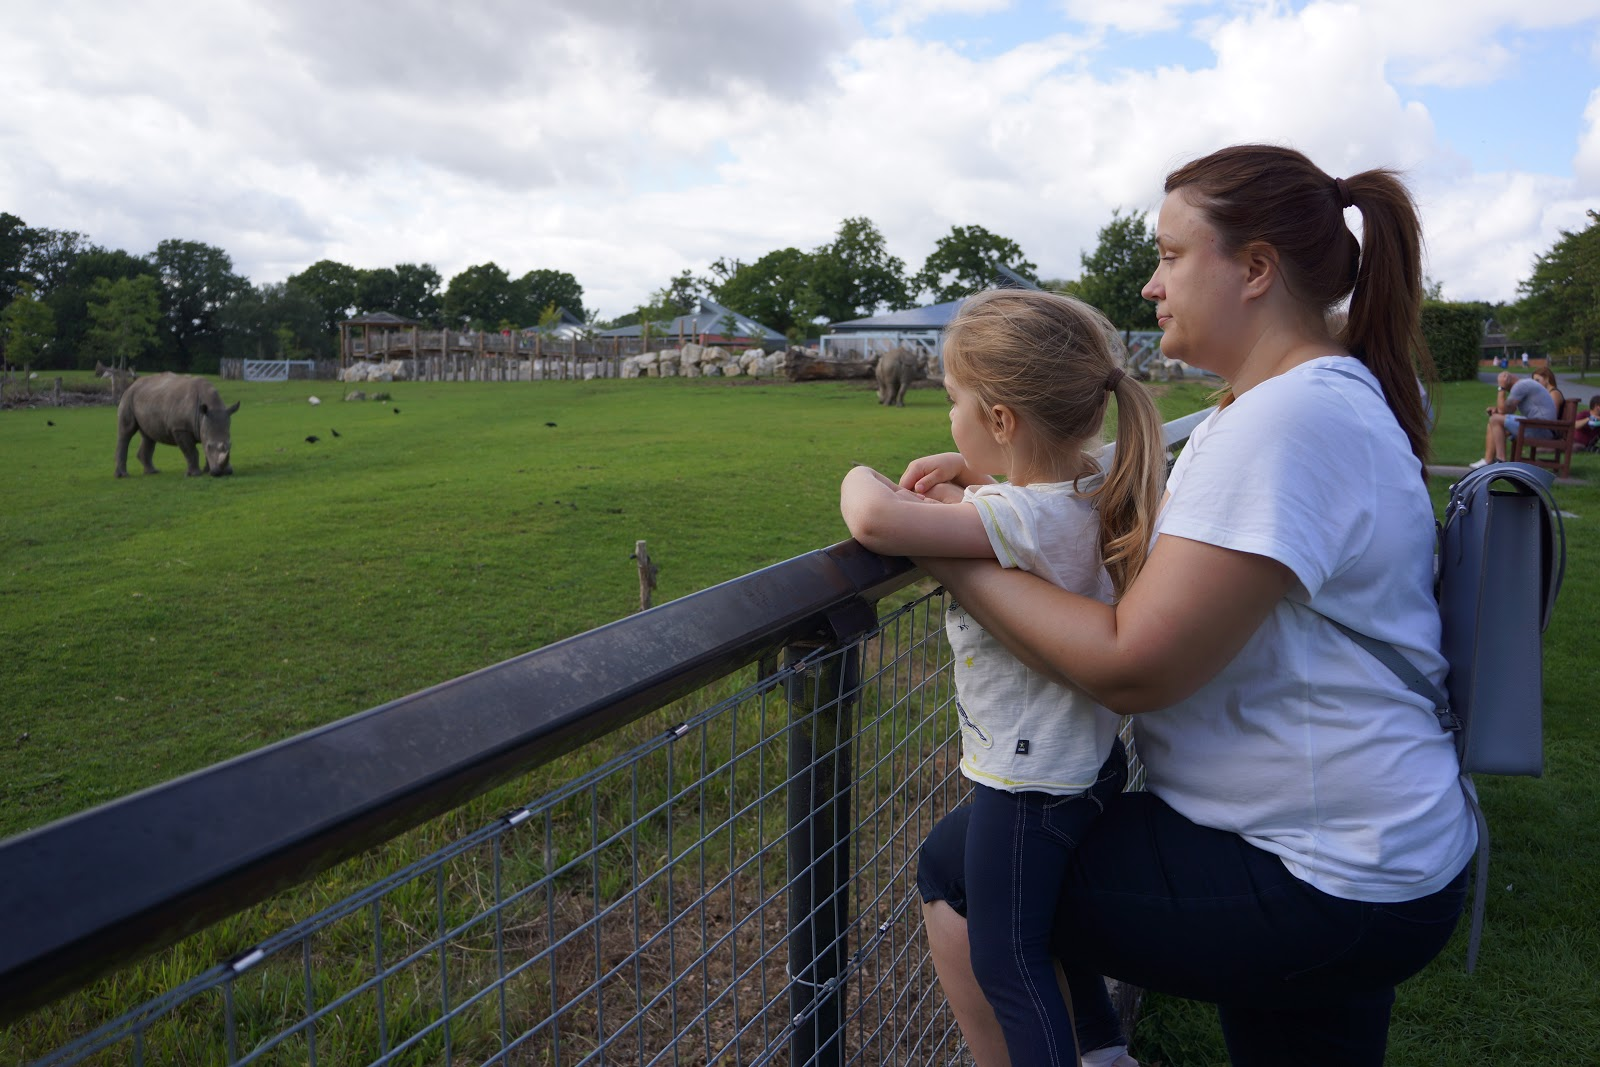 mum an daughter watching rhinos at a zoo